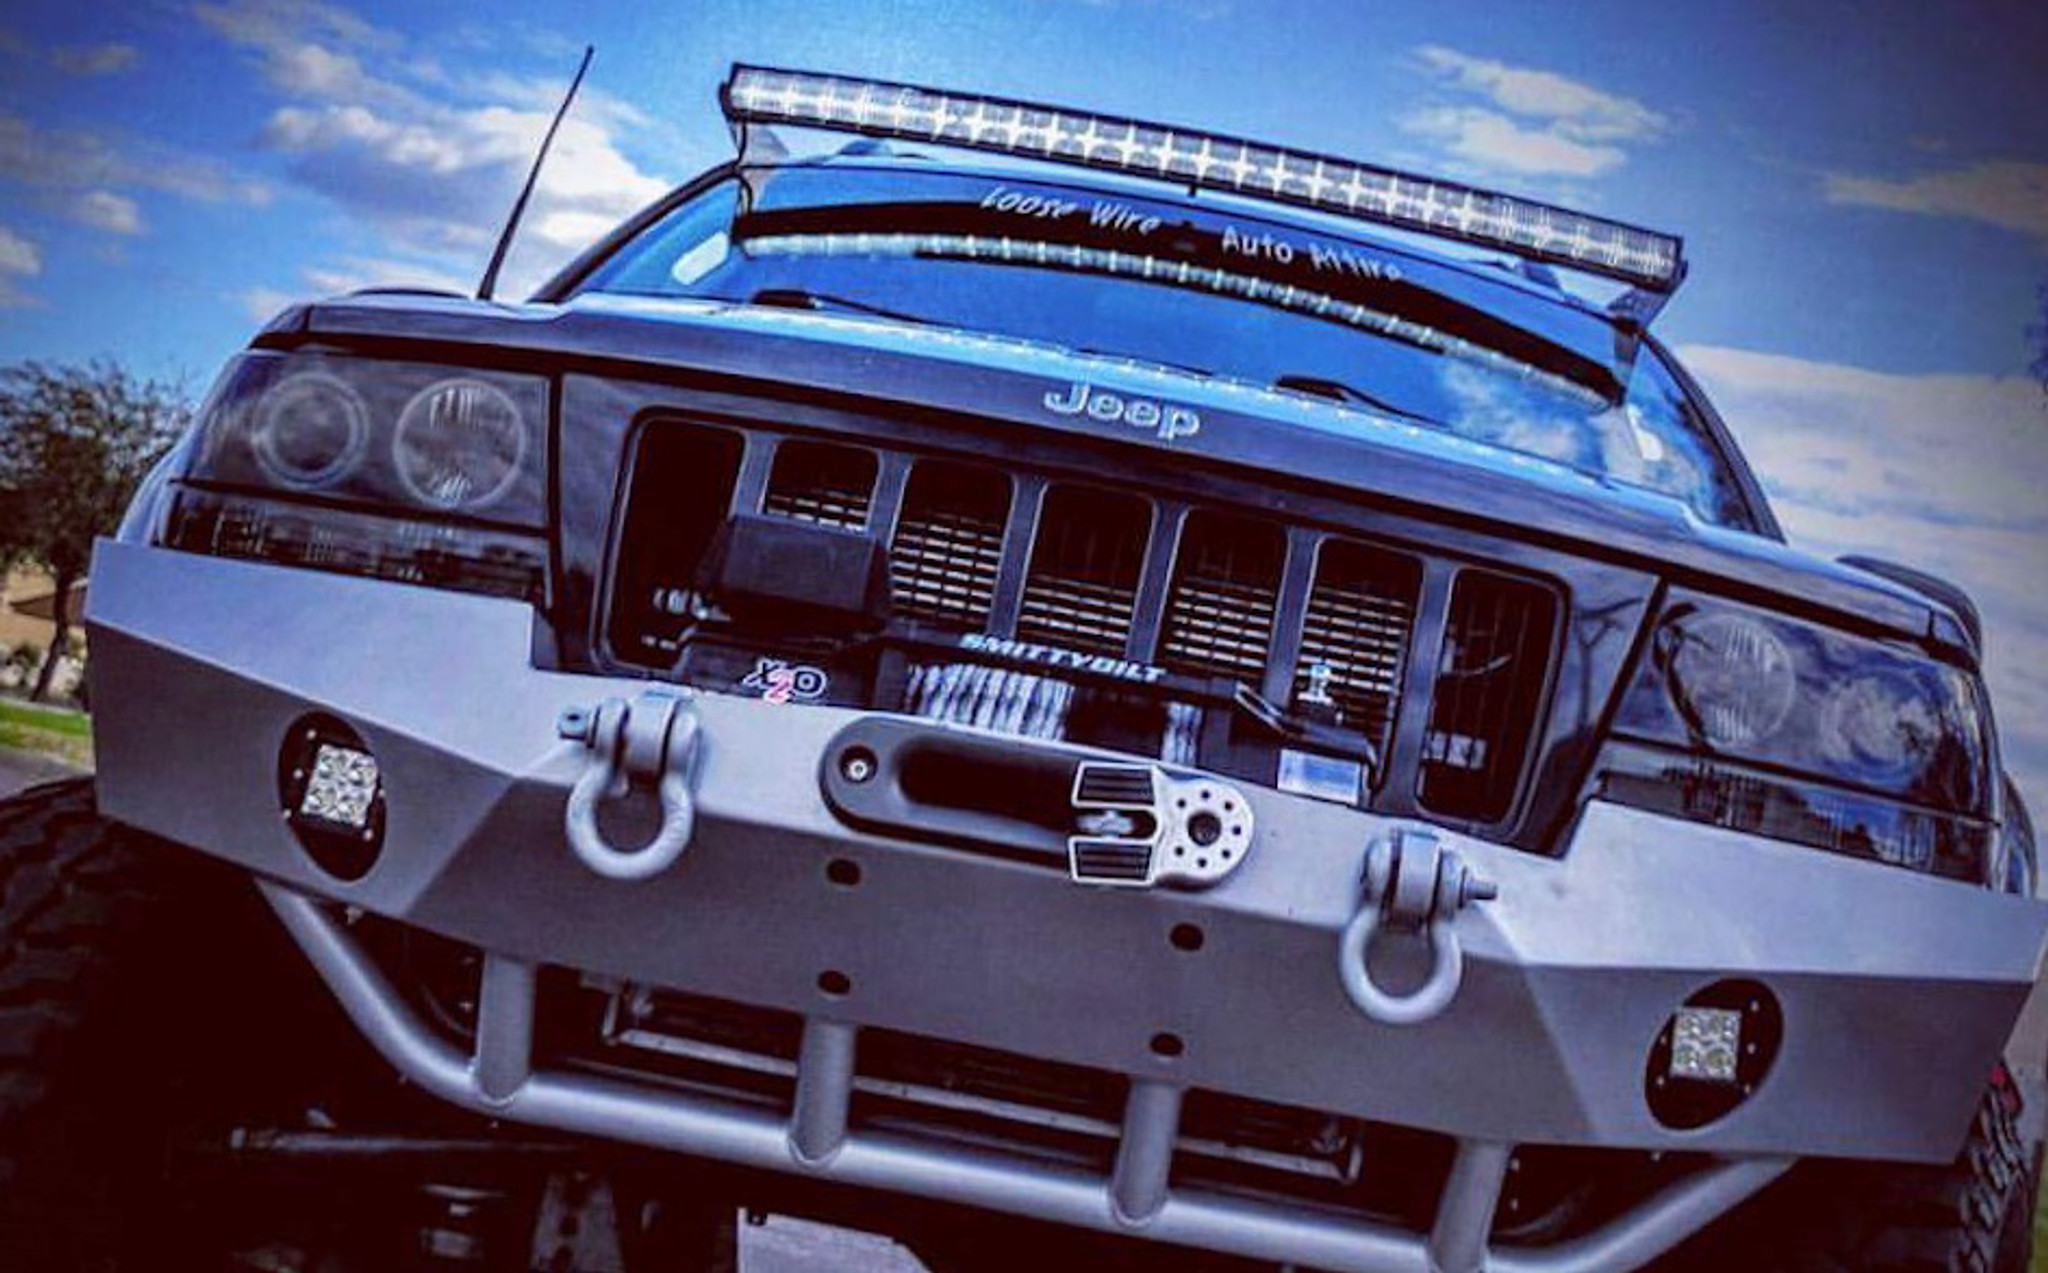 1999 2004 Jeep Grand Cherokee Wj Brackets For 52 Curved Light Bar